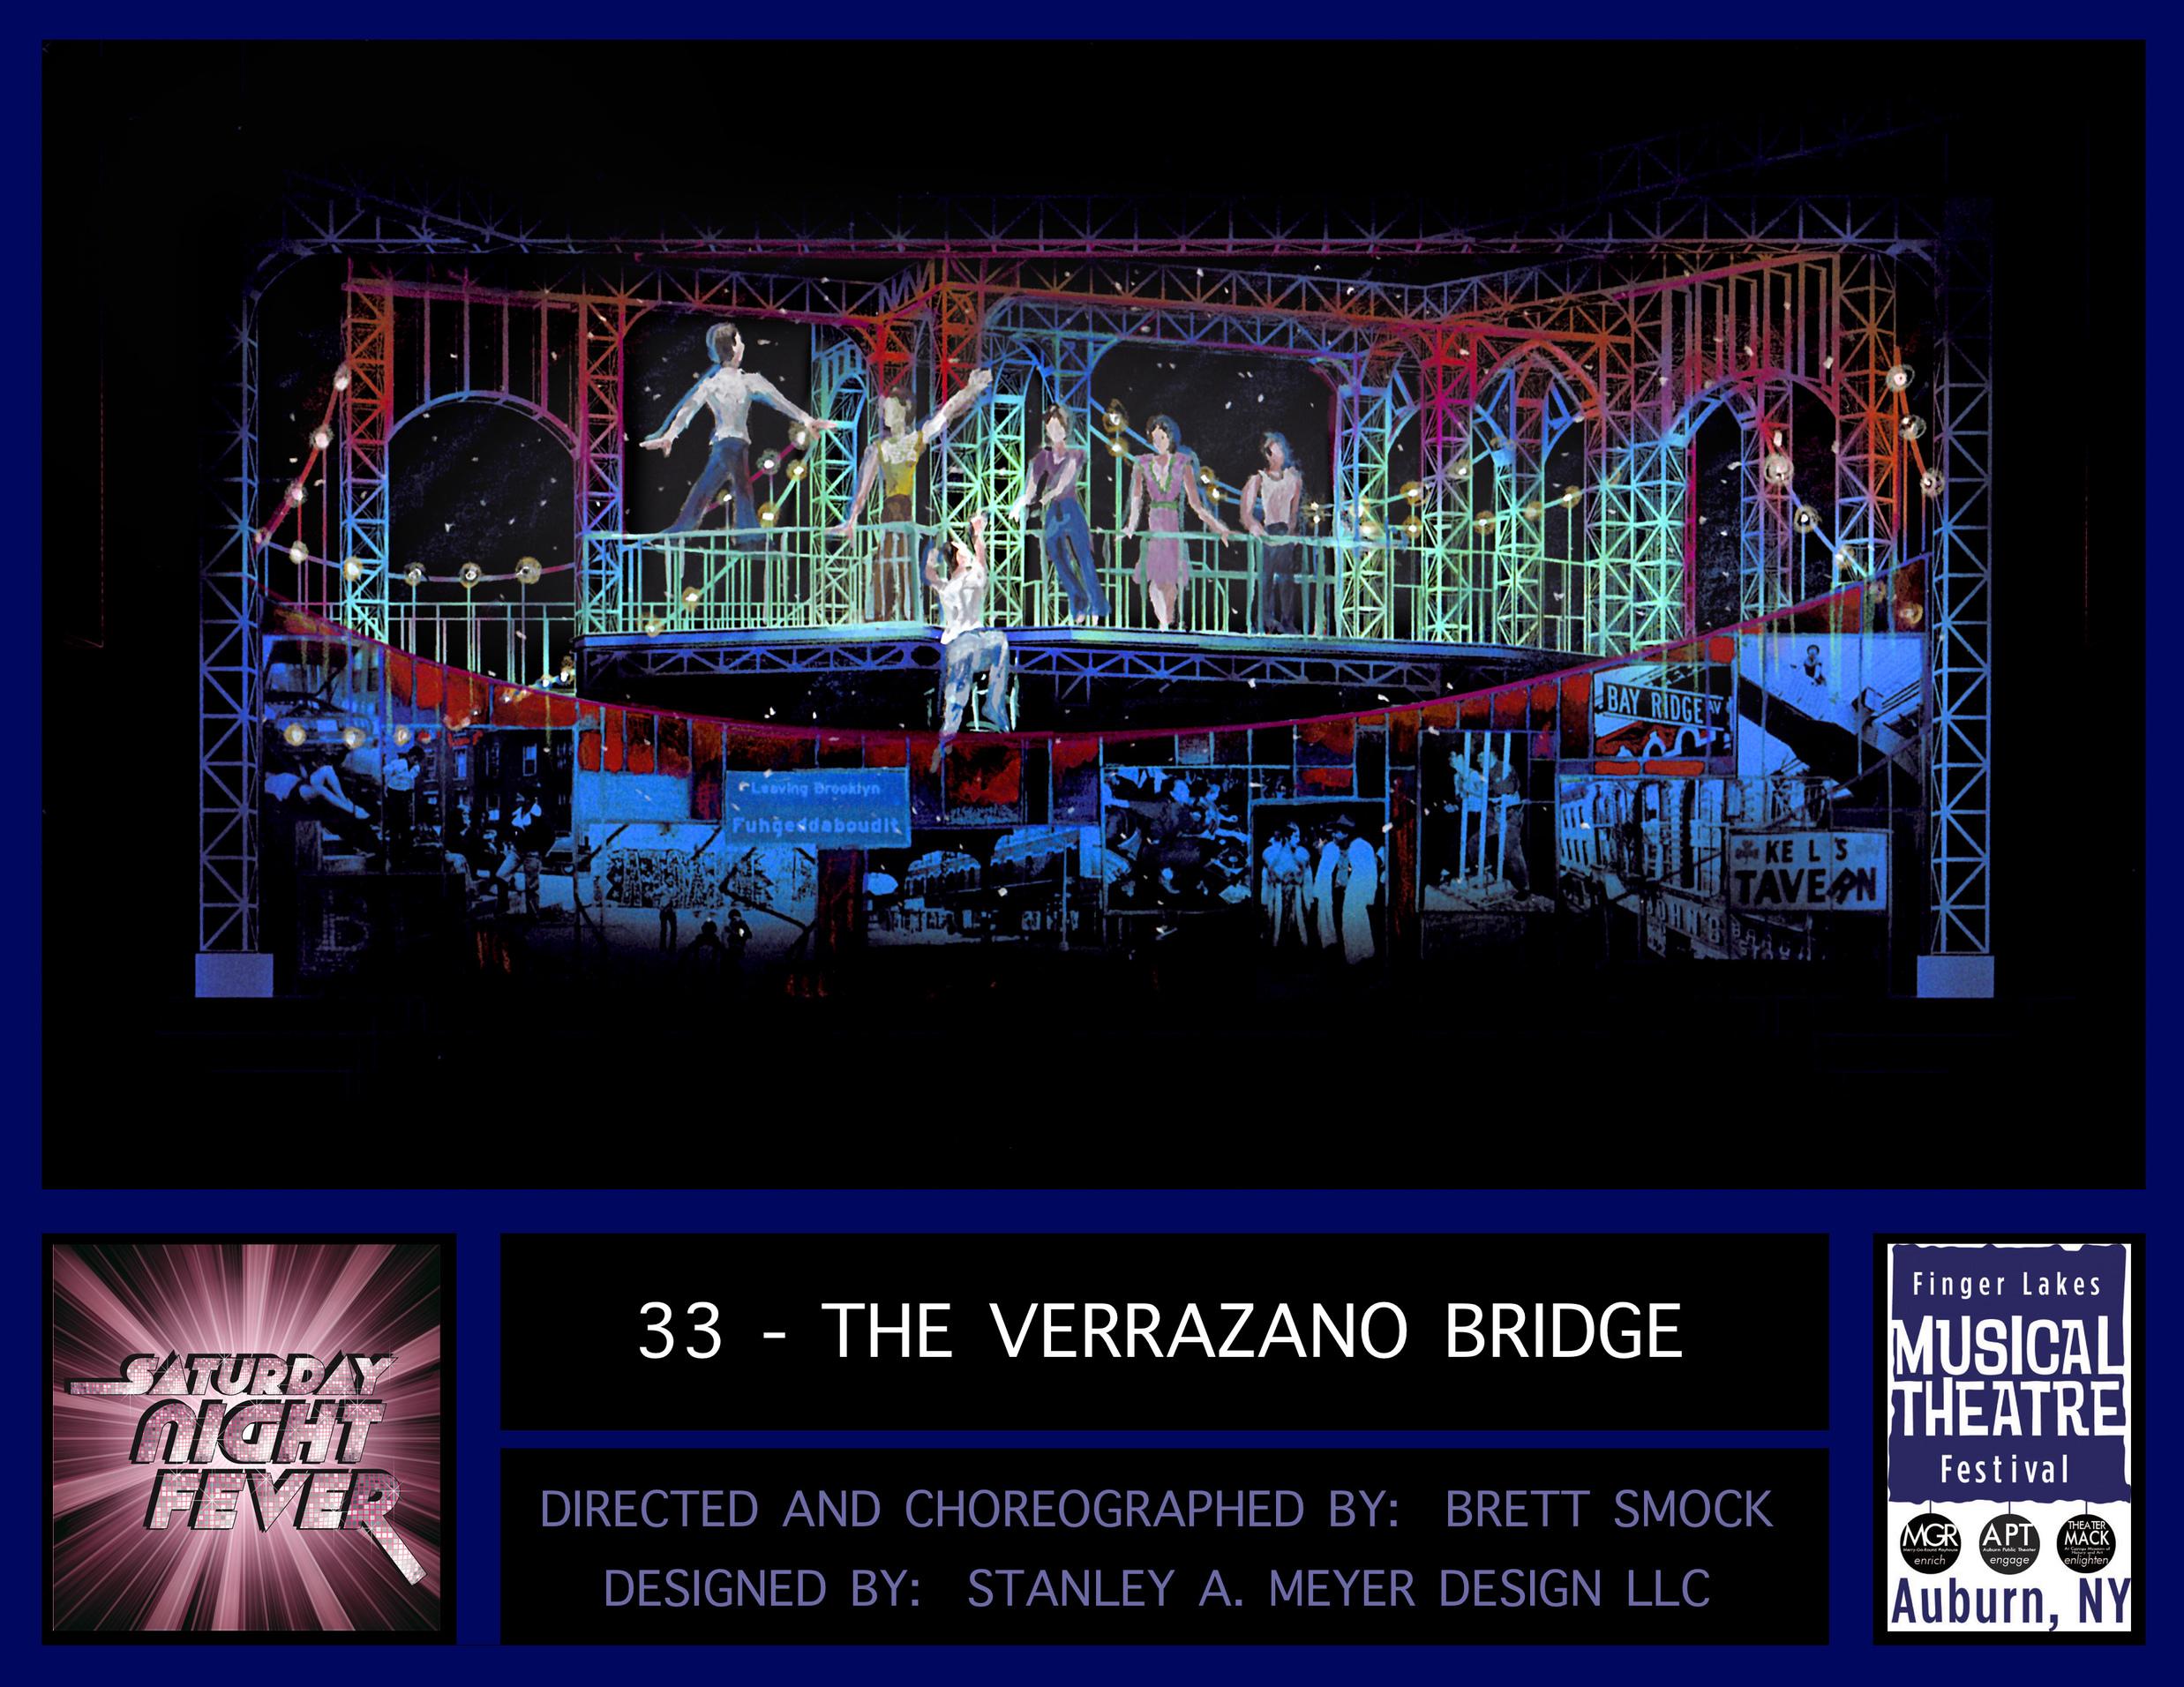 snf-33-the_verrazano_bridge.jpg